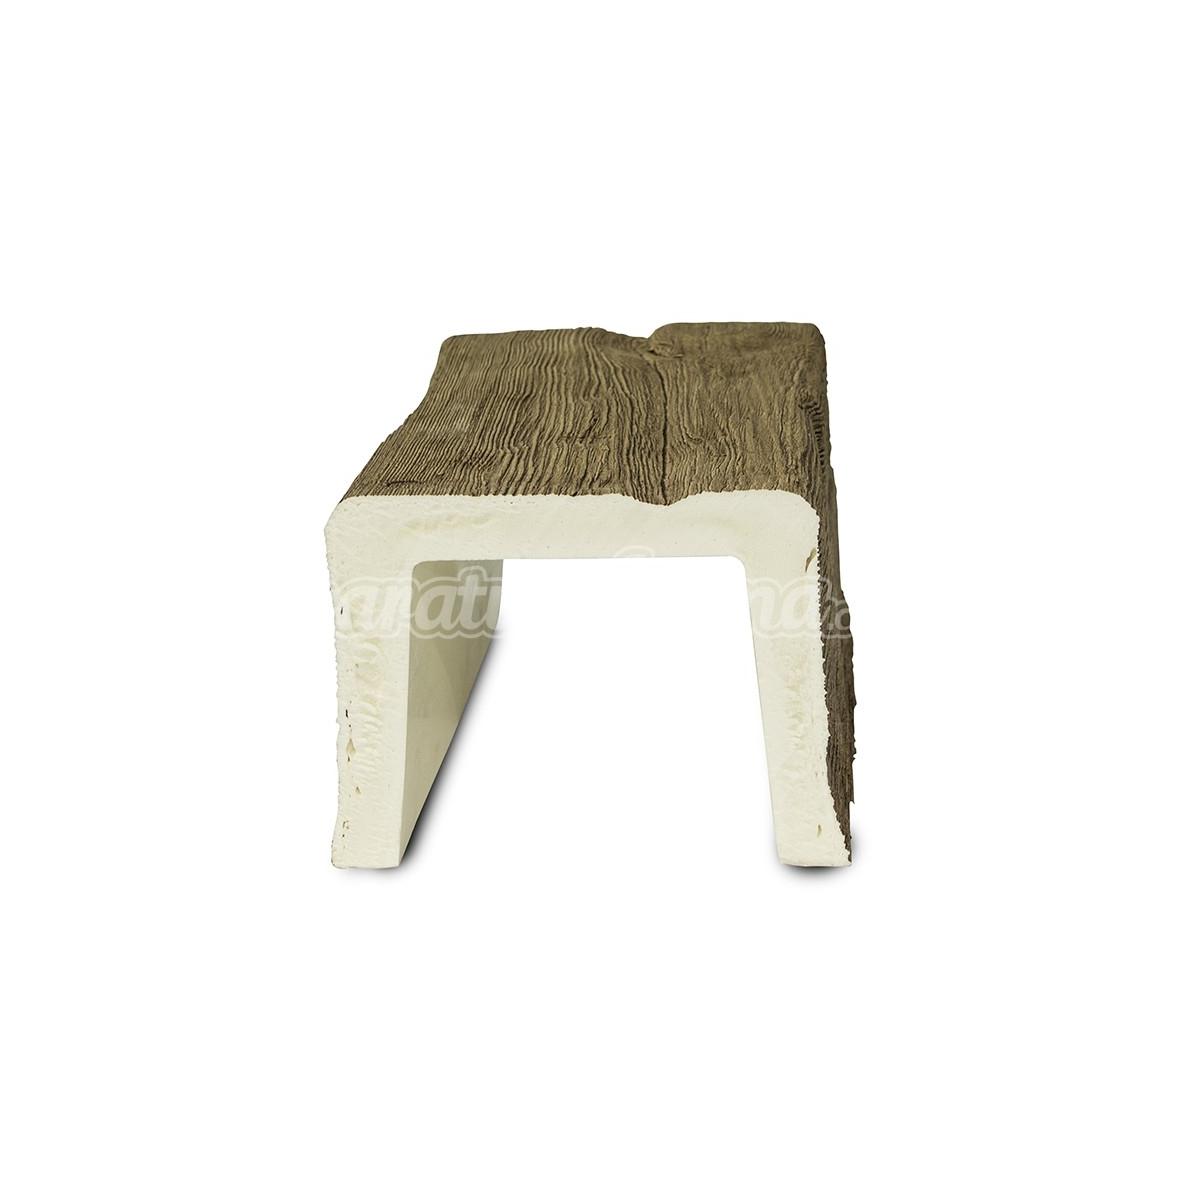 Grupo Unamacor Viga 300x16x13 imitación madera